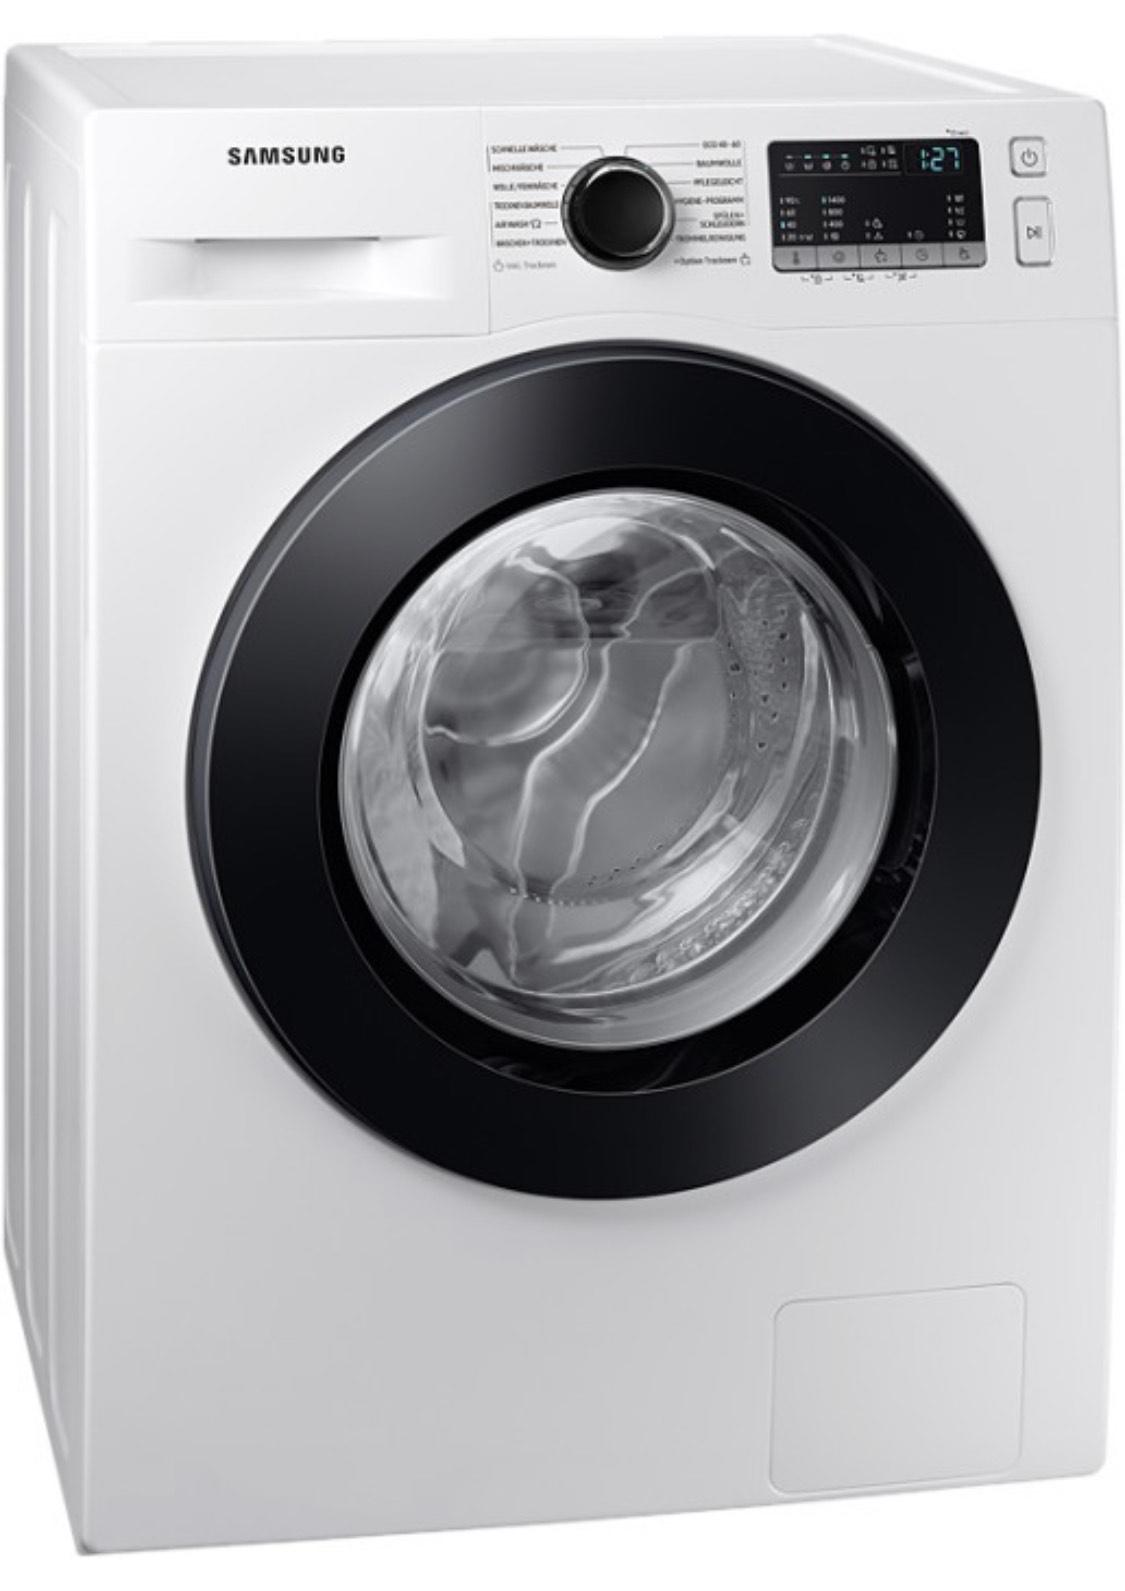 SAMSUNG Waschtrockner bei Hofer